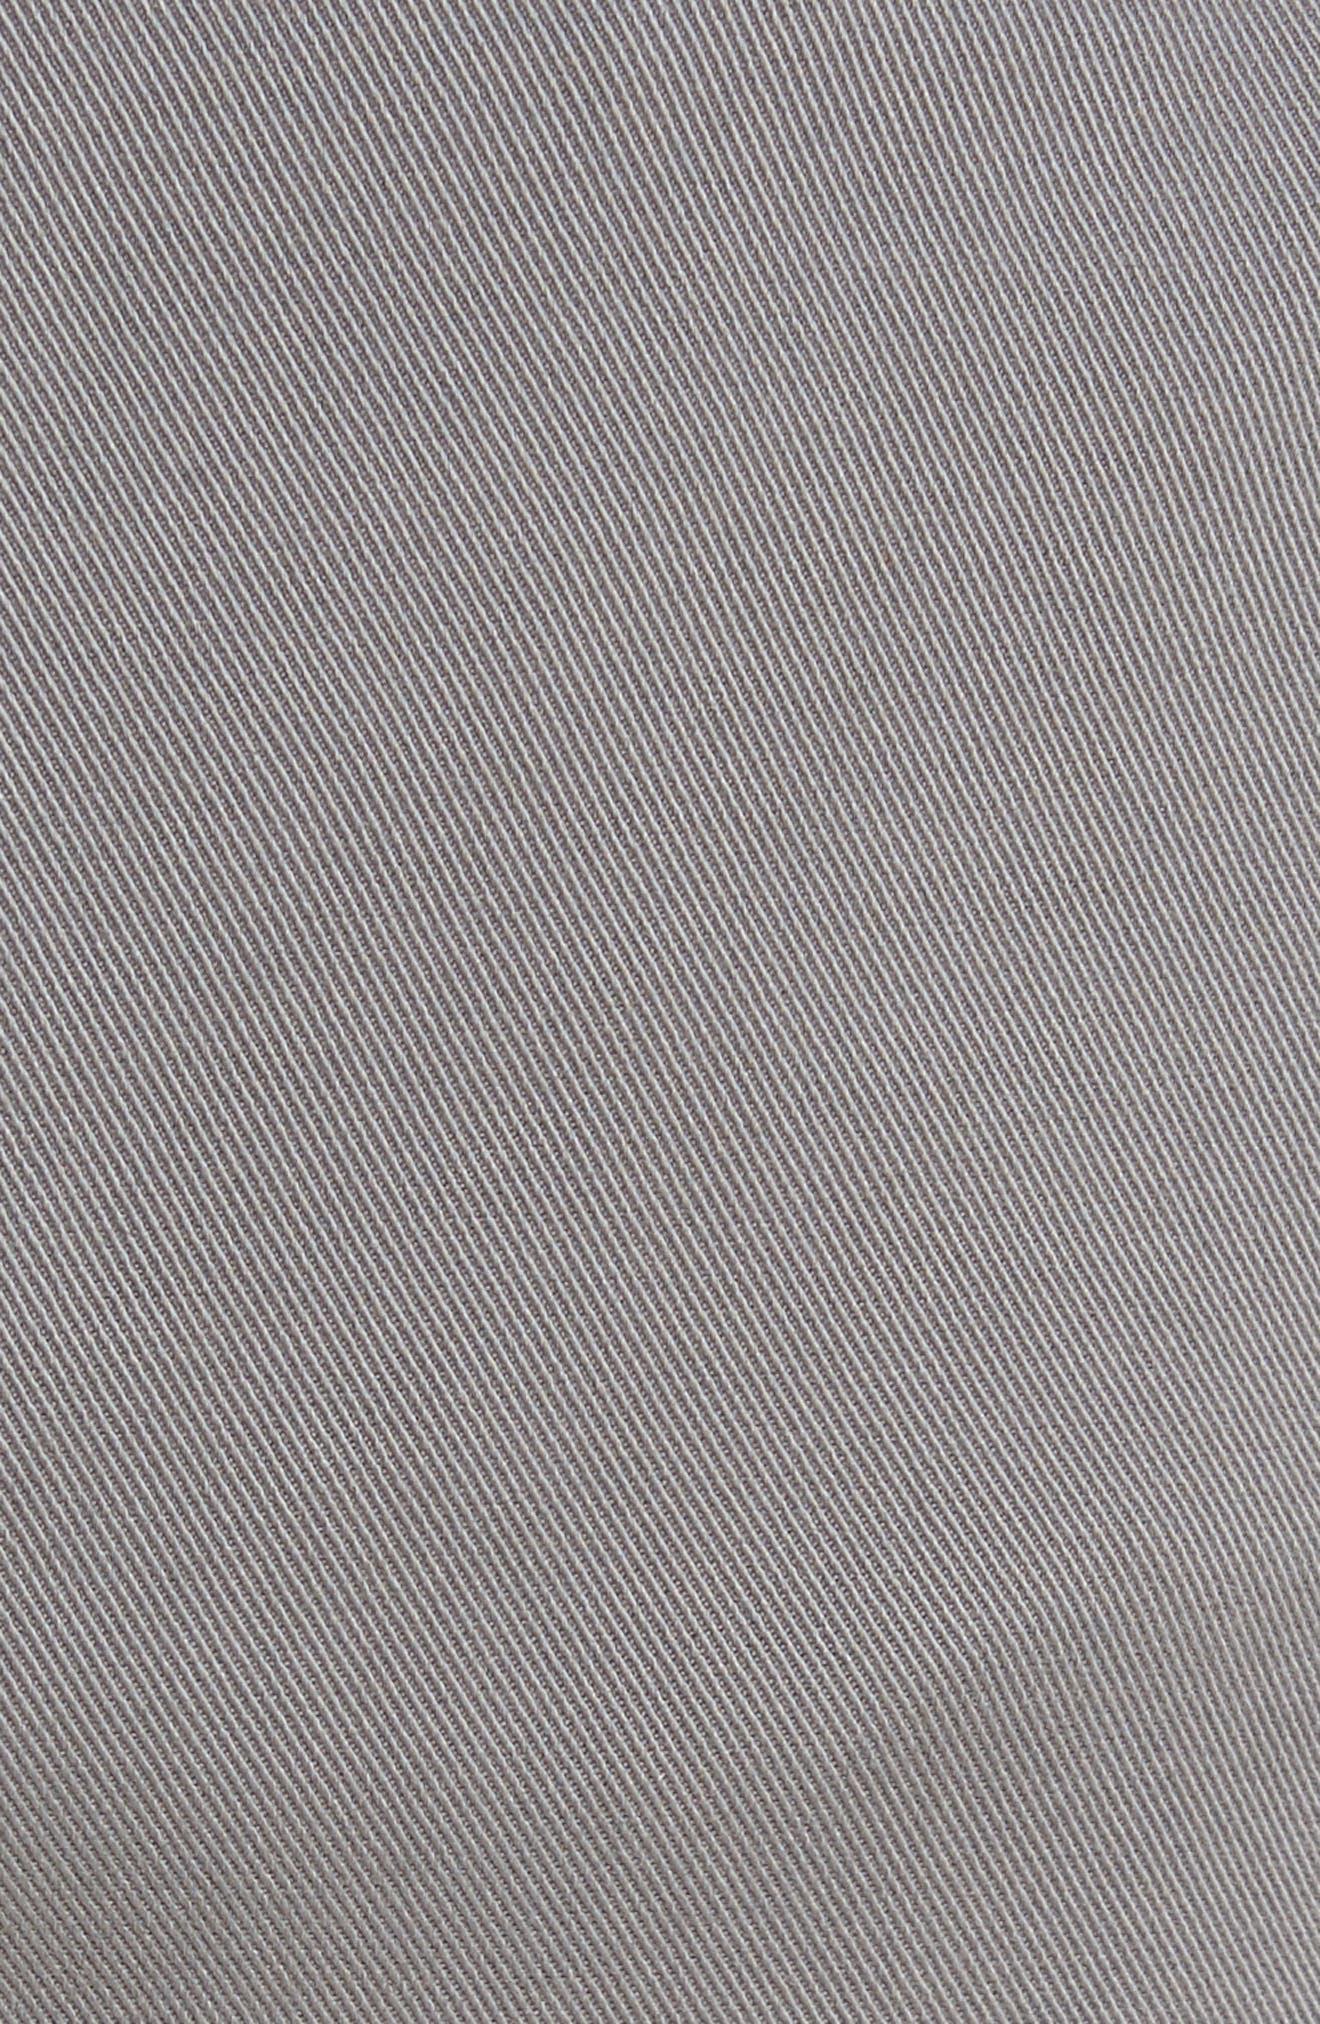 Kaito Stretch Chino Pants,                             Alternate thumbnail 5, color,                             069